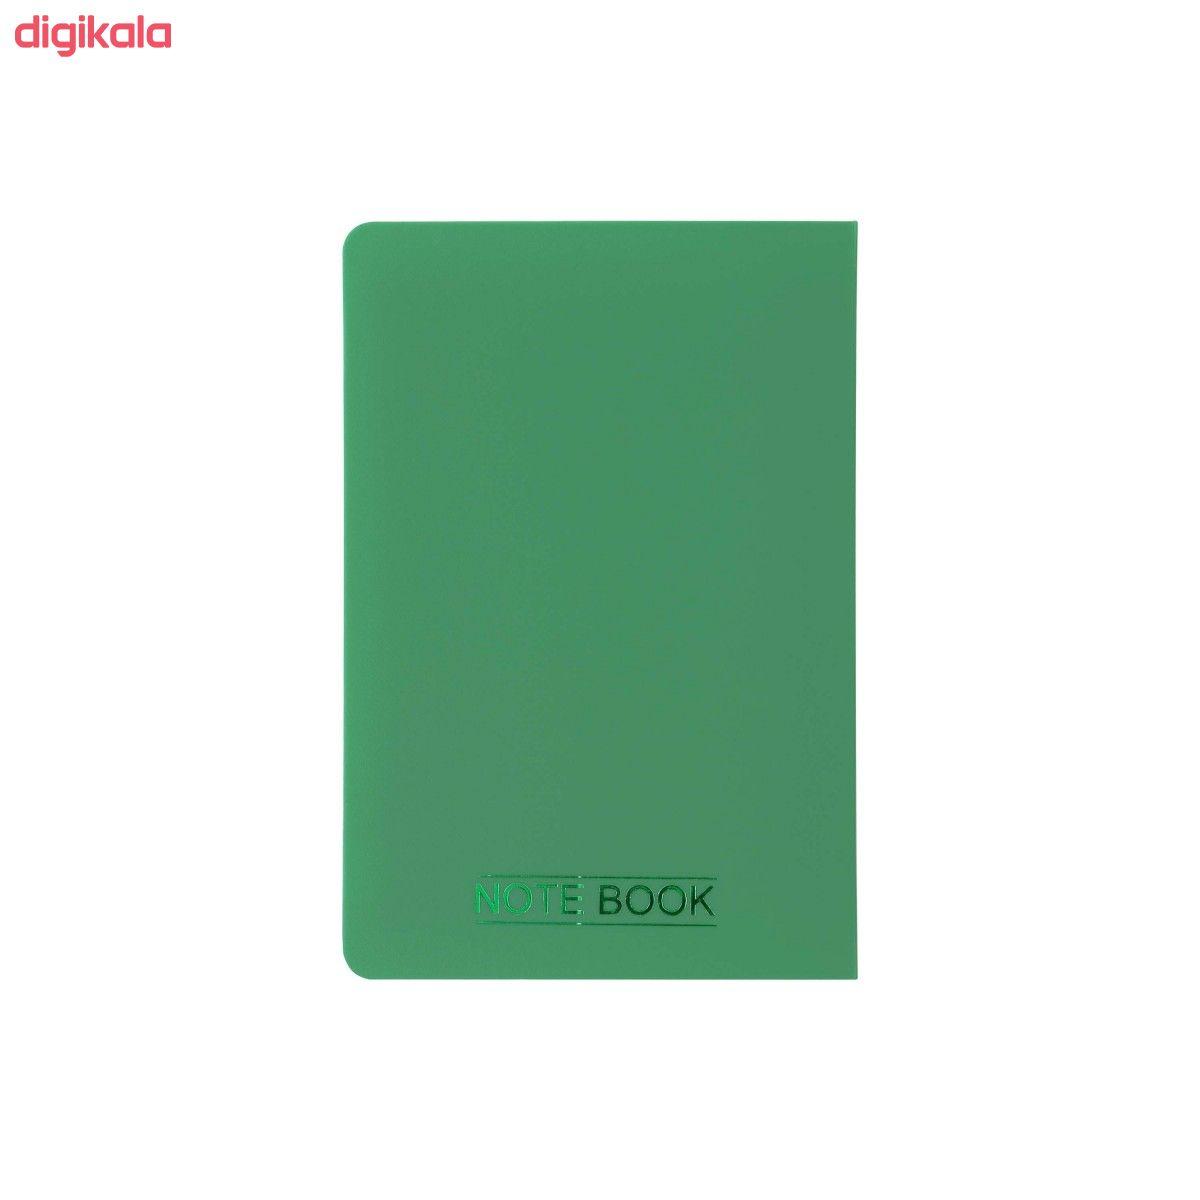 دفتر یادداشت 120 برگ پاپکو مدل  NB-638 کد HT01 main 1 6